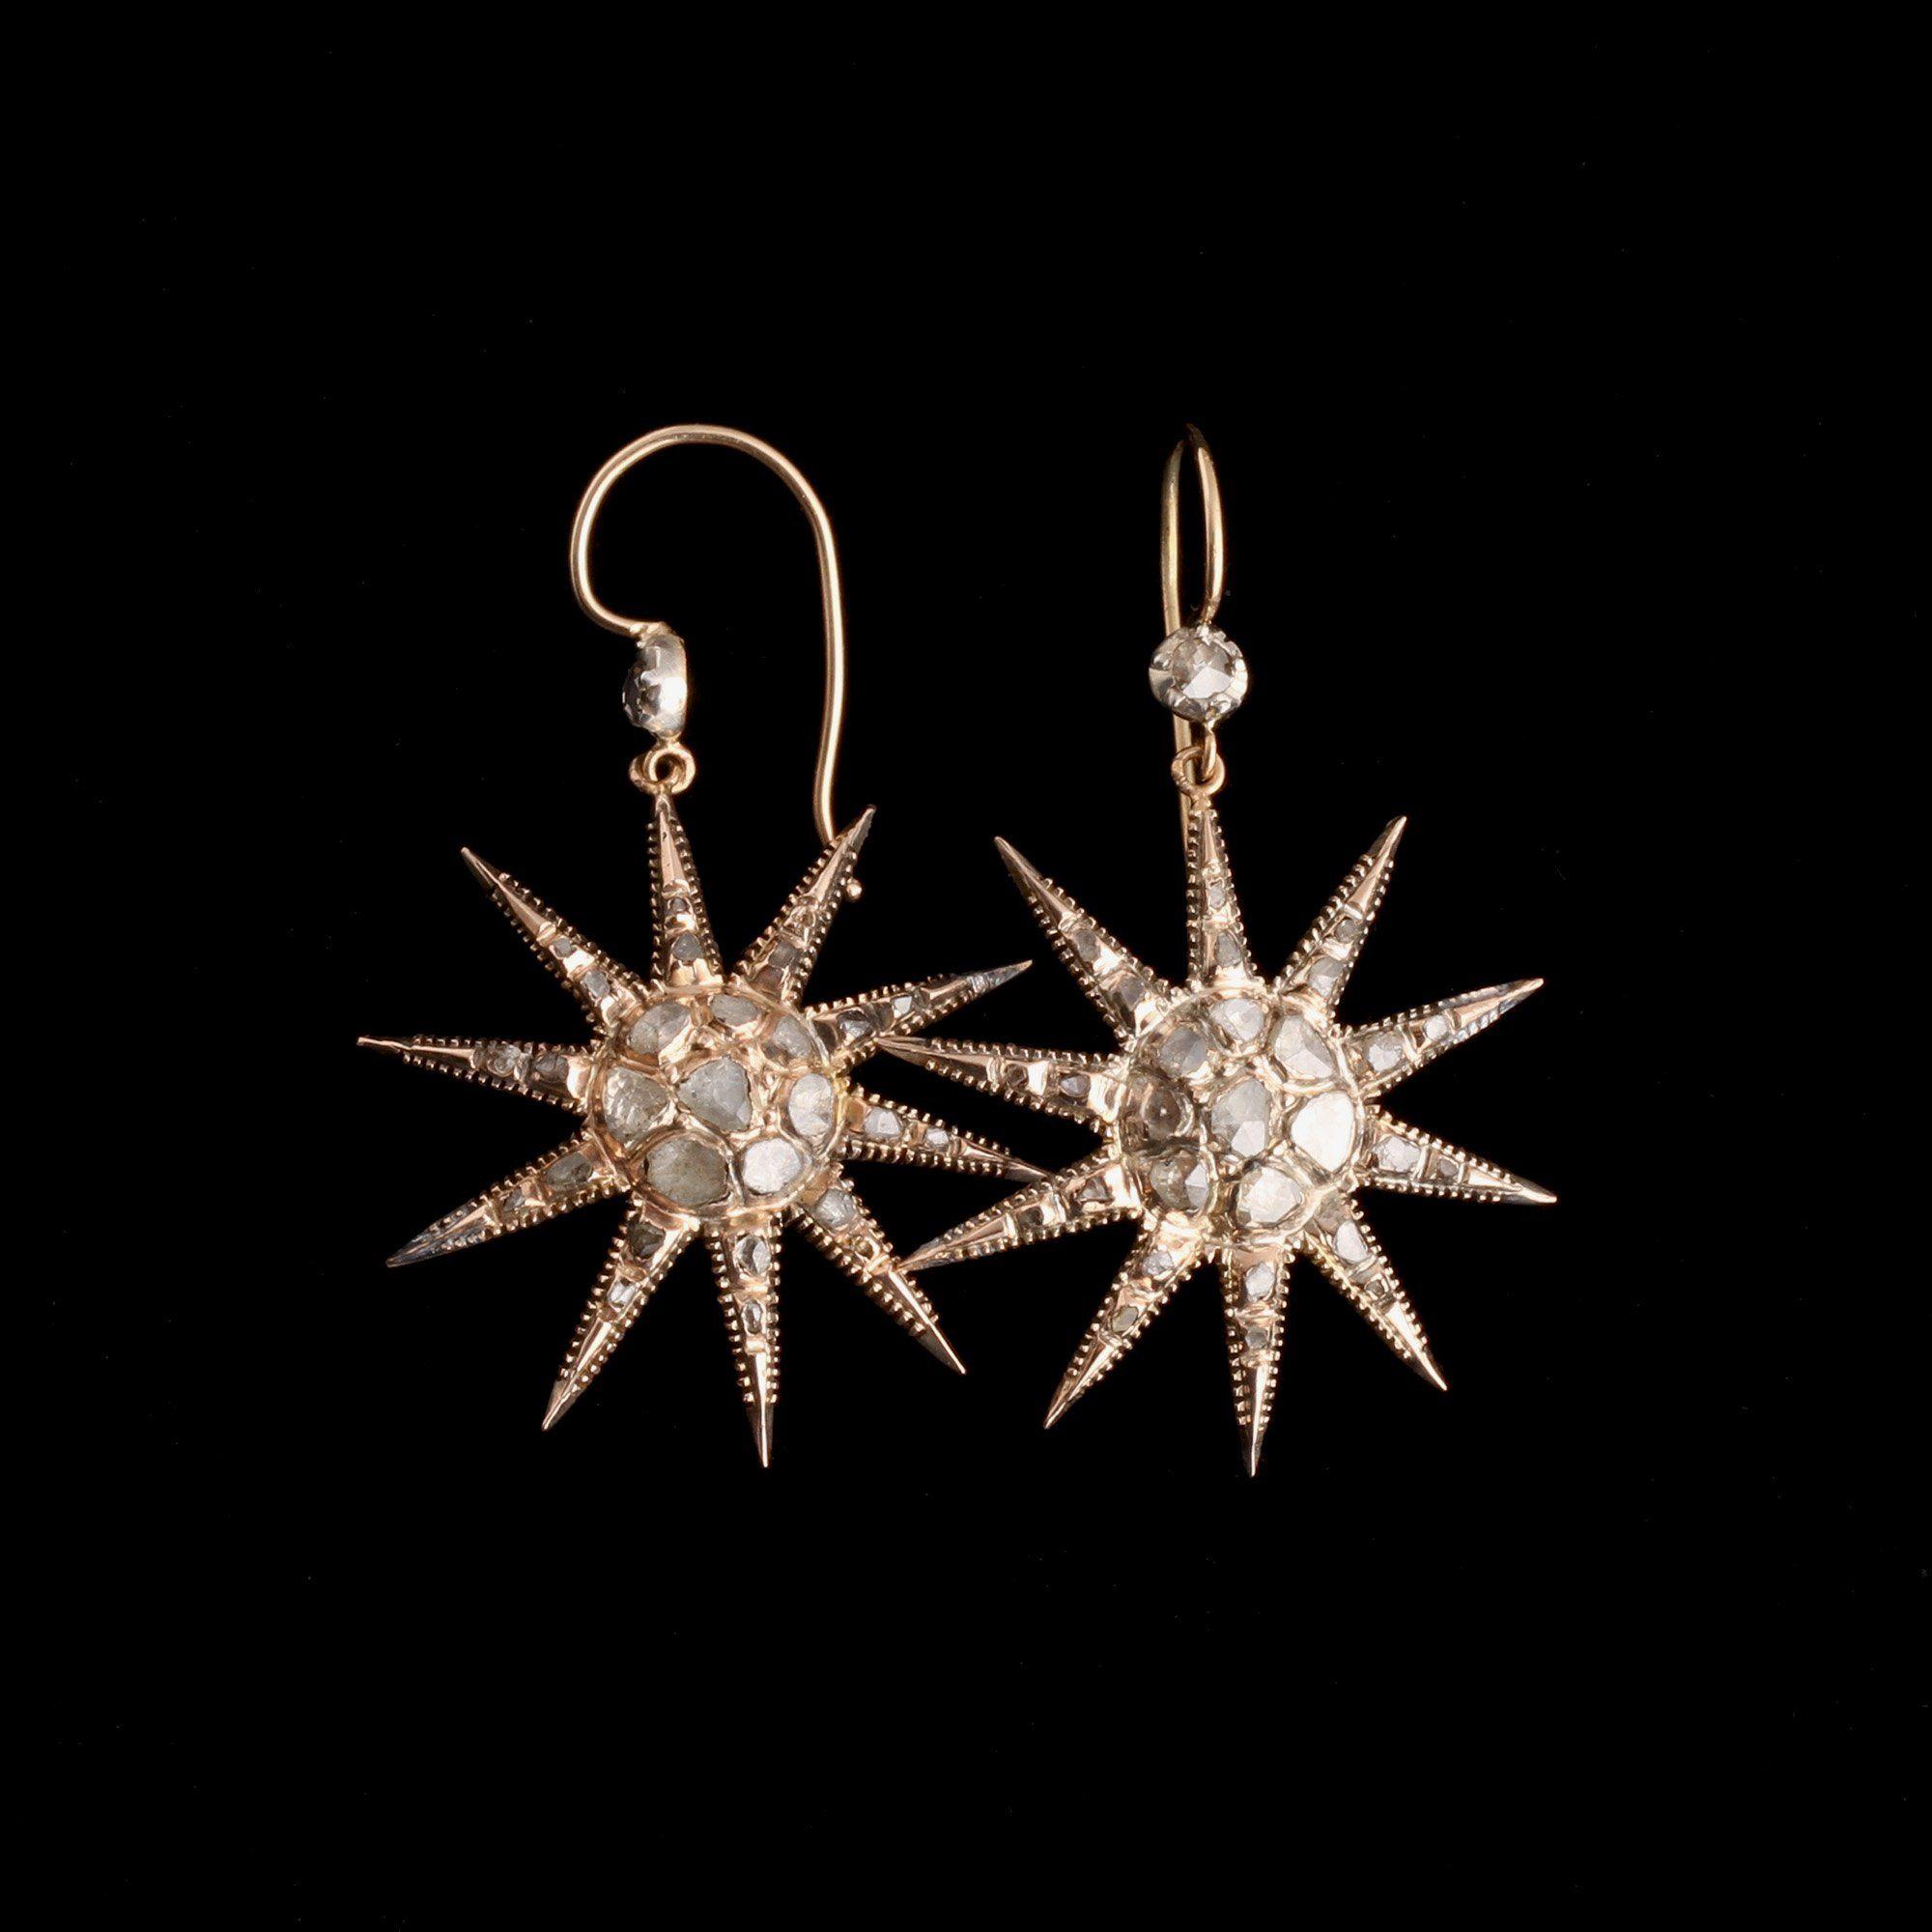 Victorian Diamond Starburst Earrings